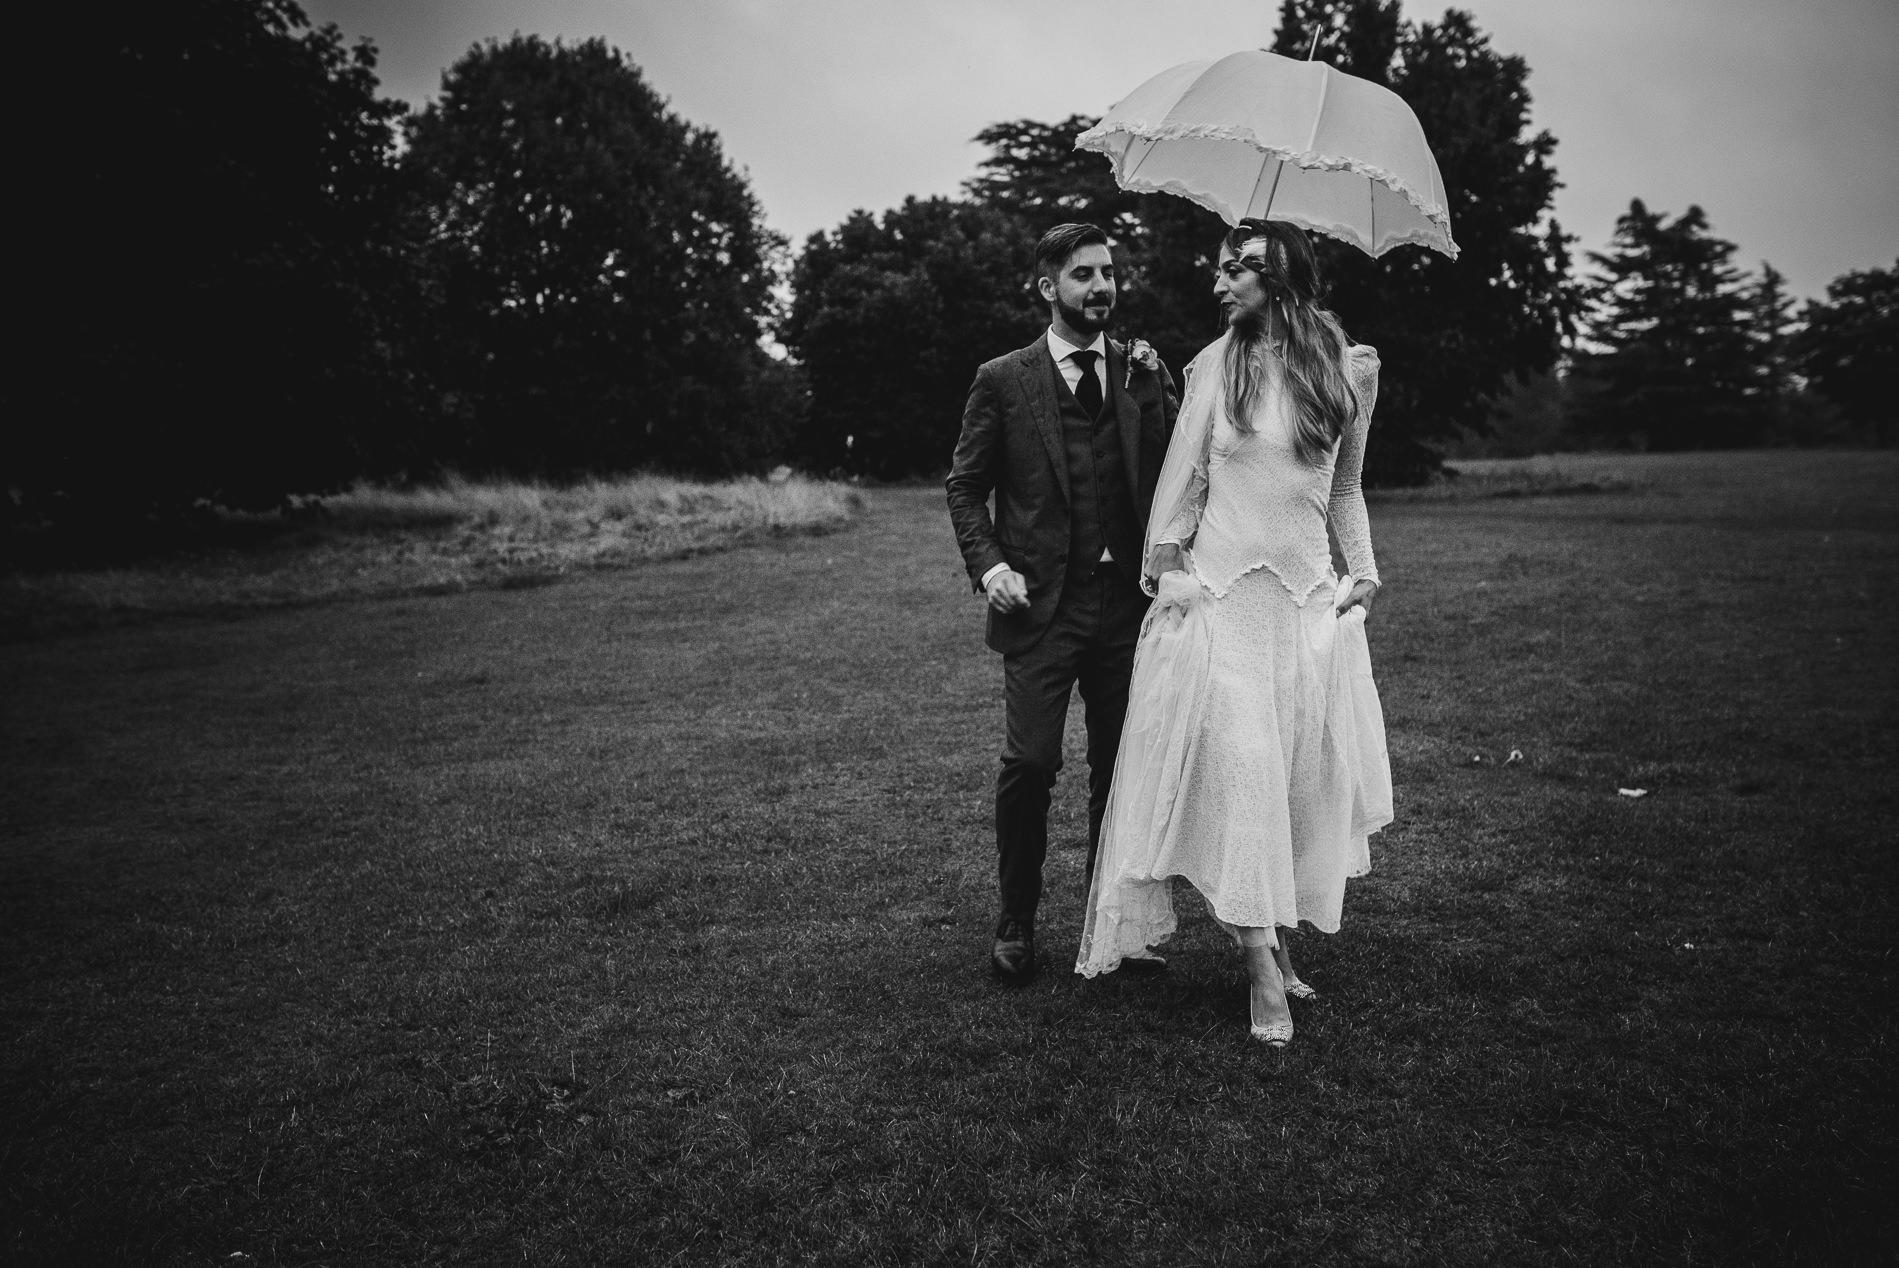 bohemian_wedding_lawshall_church_garden131